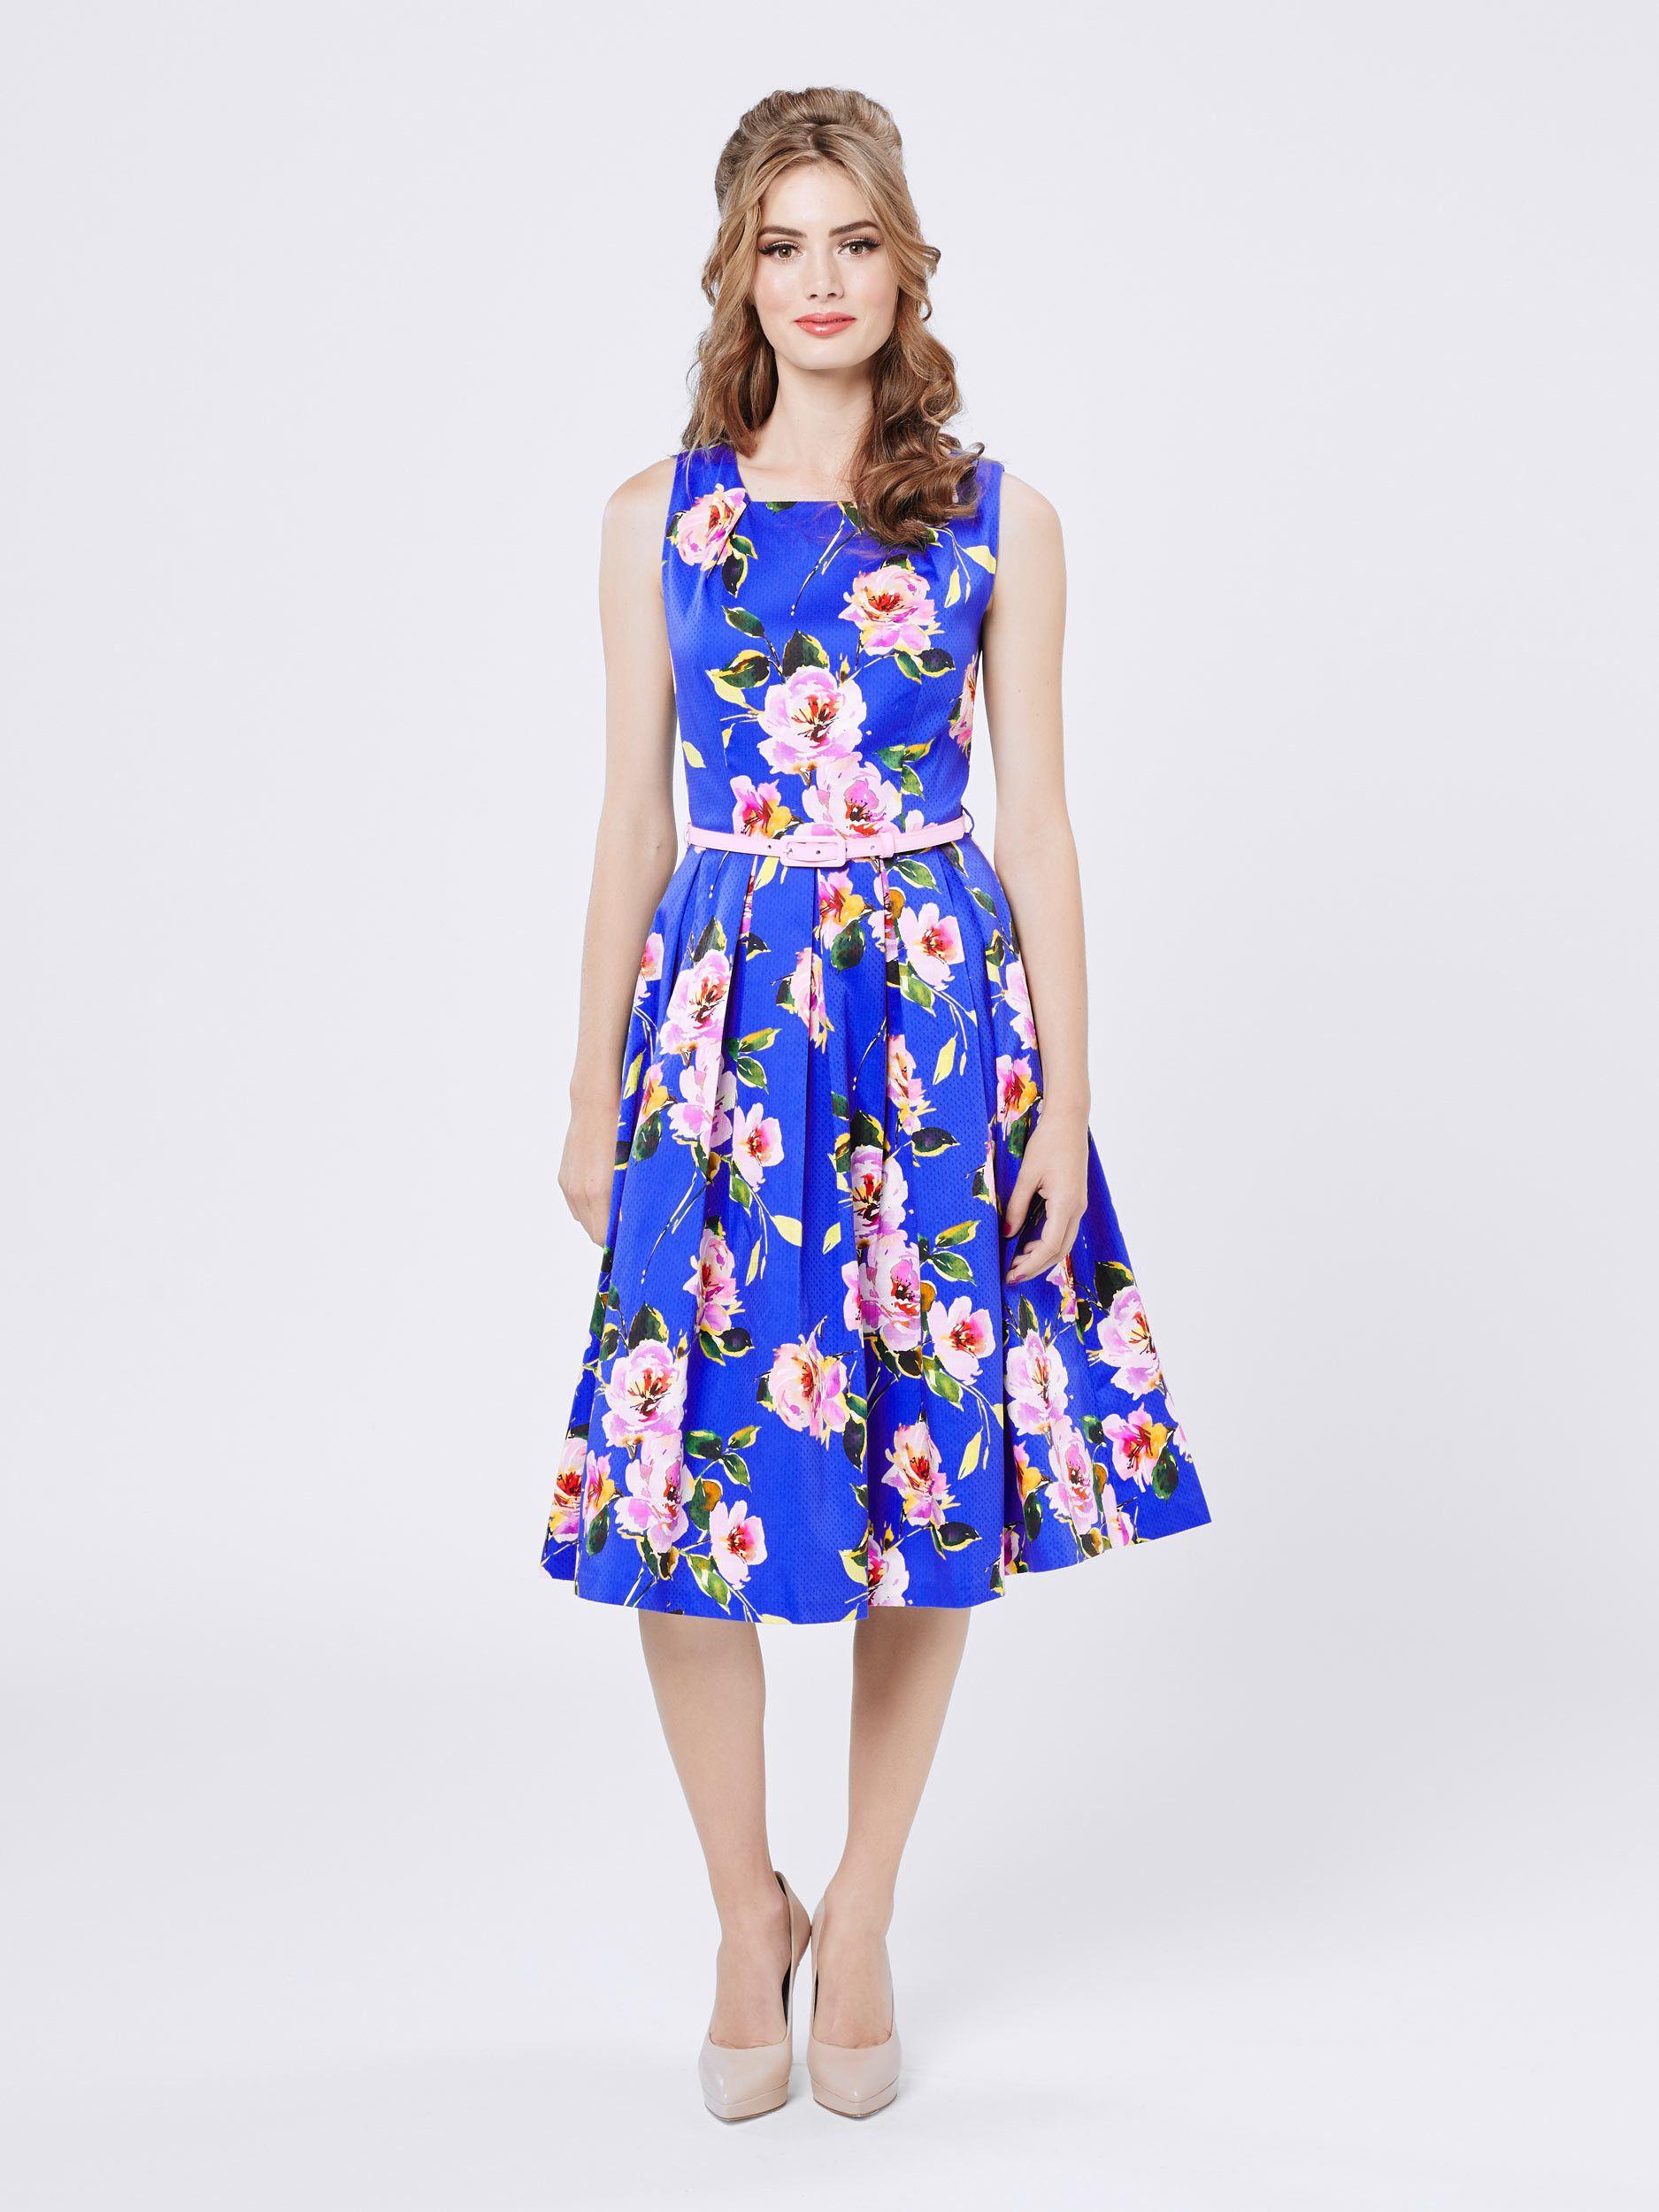 c7f01cf087c Alouette Prom Dress. Alouette Prom Dress Prom Dress Shopping